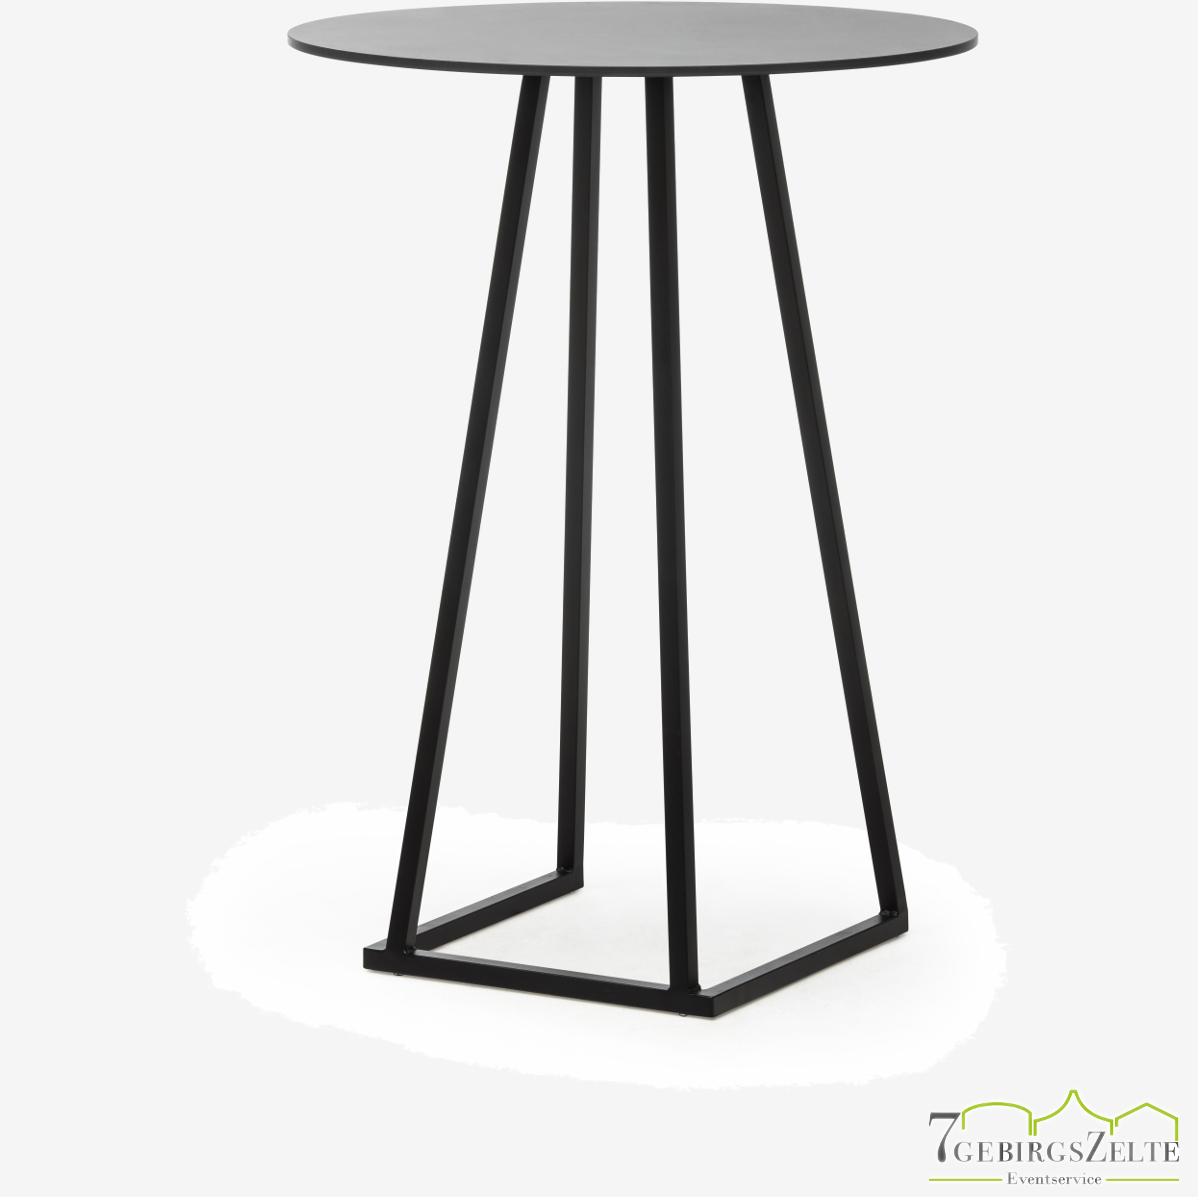 Linéa Party Round D80 x 110cm - alu schwarz  - top compact schwarz